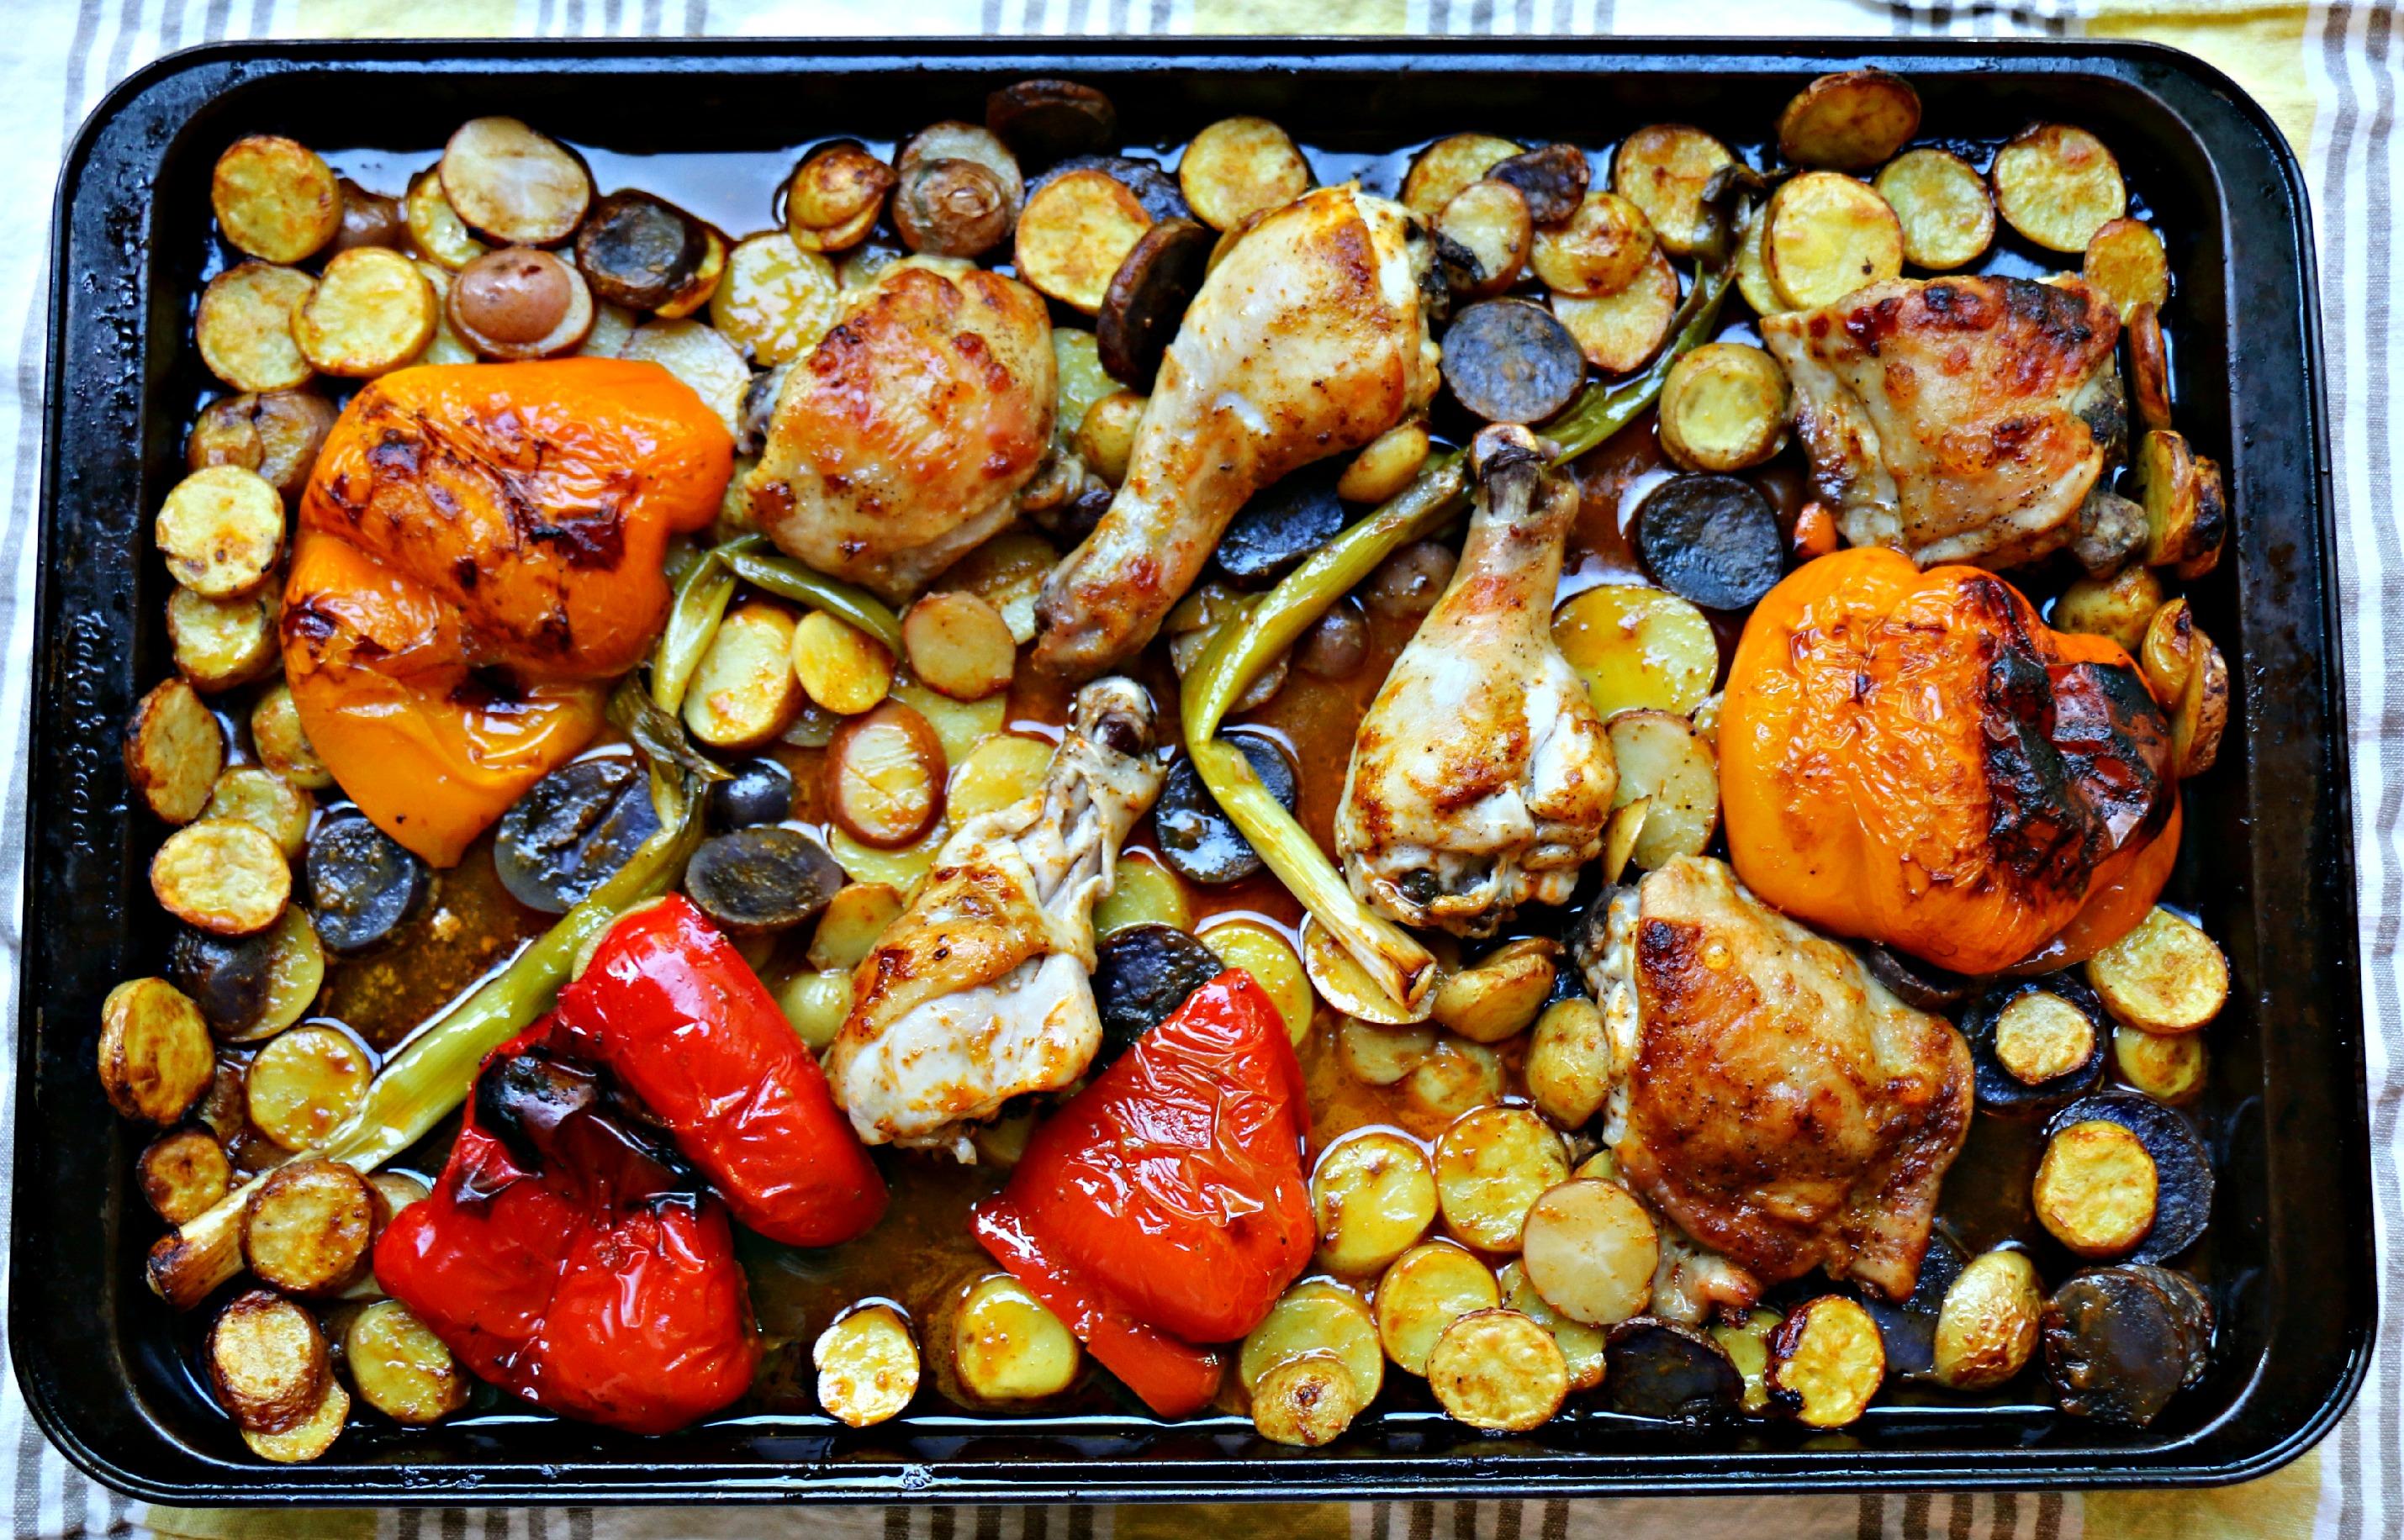 Harissa Chicken, Potatoes and Veg